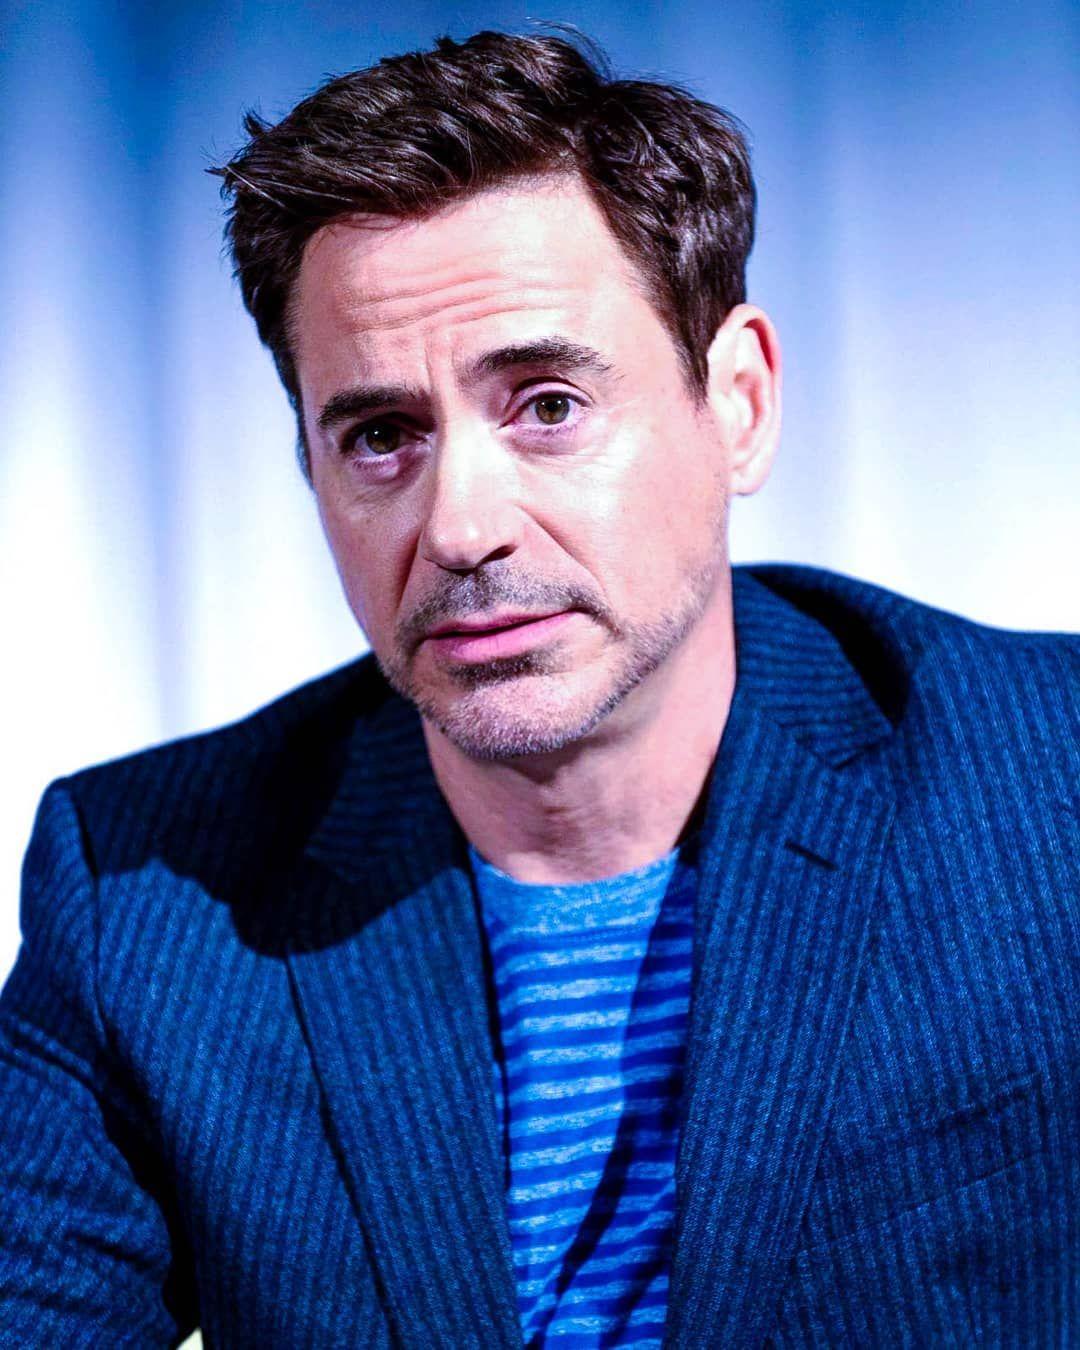 Robert Downey Jr Follow Me Imrobertdowneyjr2